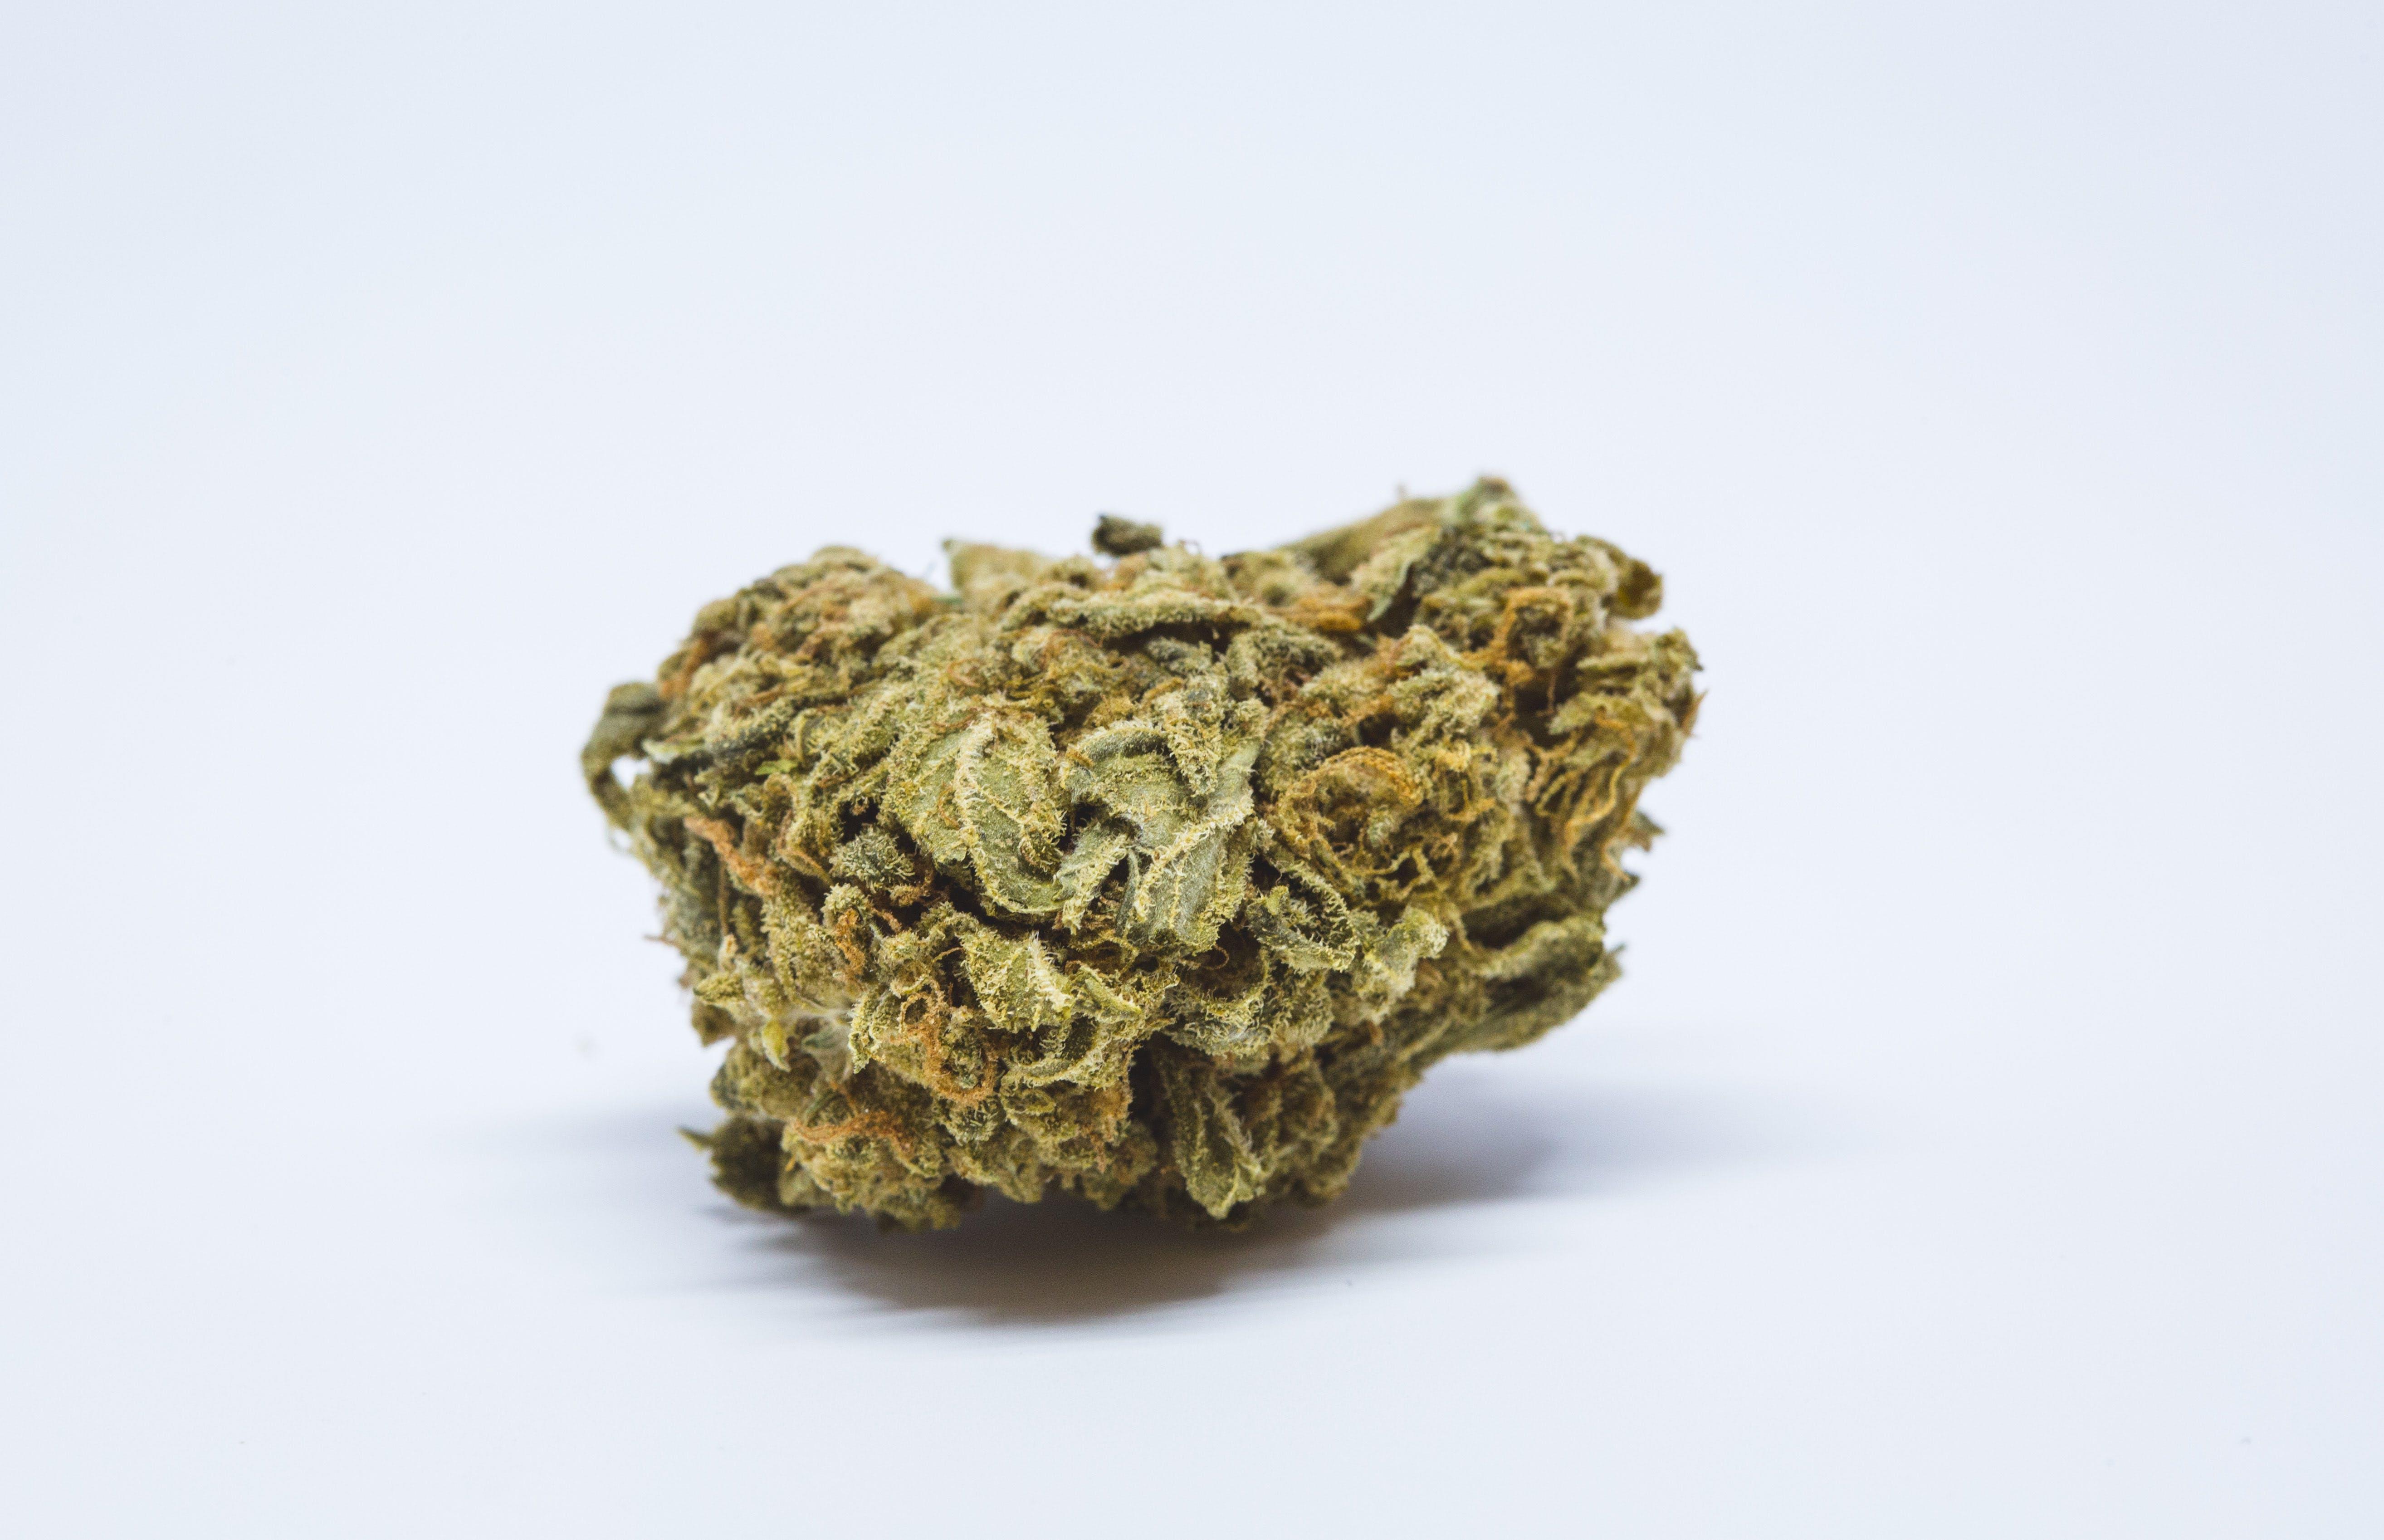 Sunset Sherbet Weed; Sunset Sherbet Cannabis Strain; Sunset Sherbet Hybrid Marijuana Strain